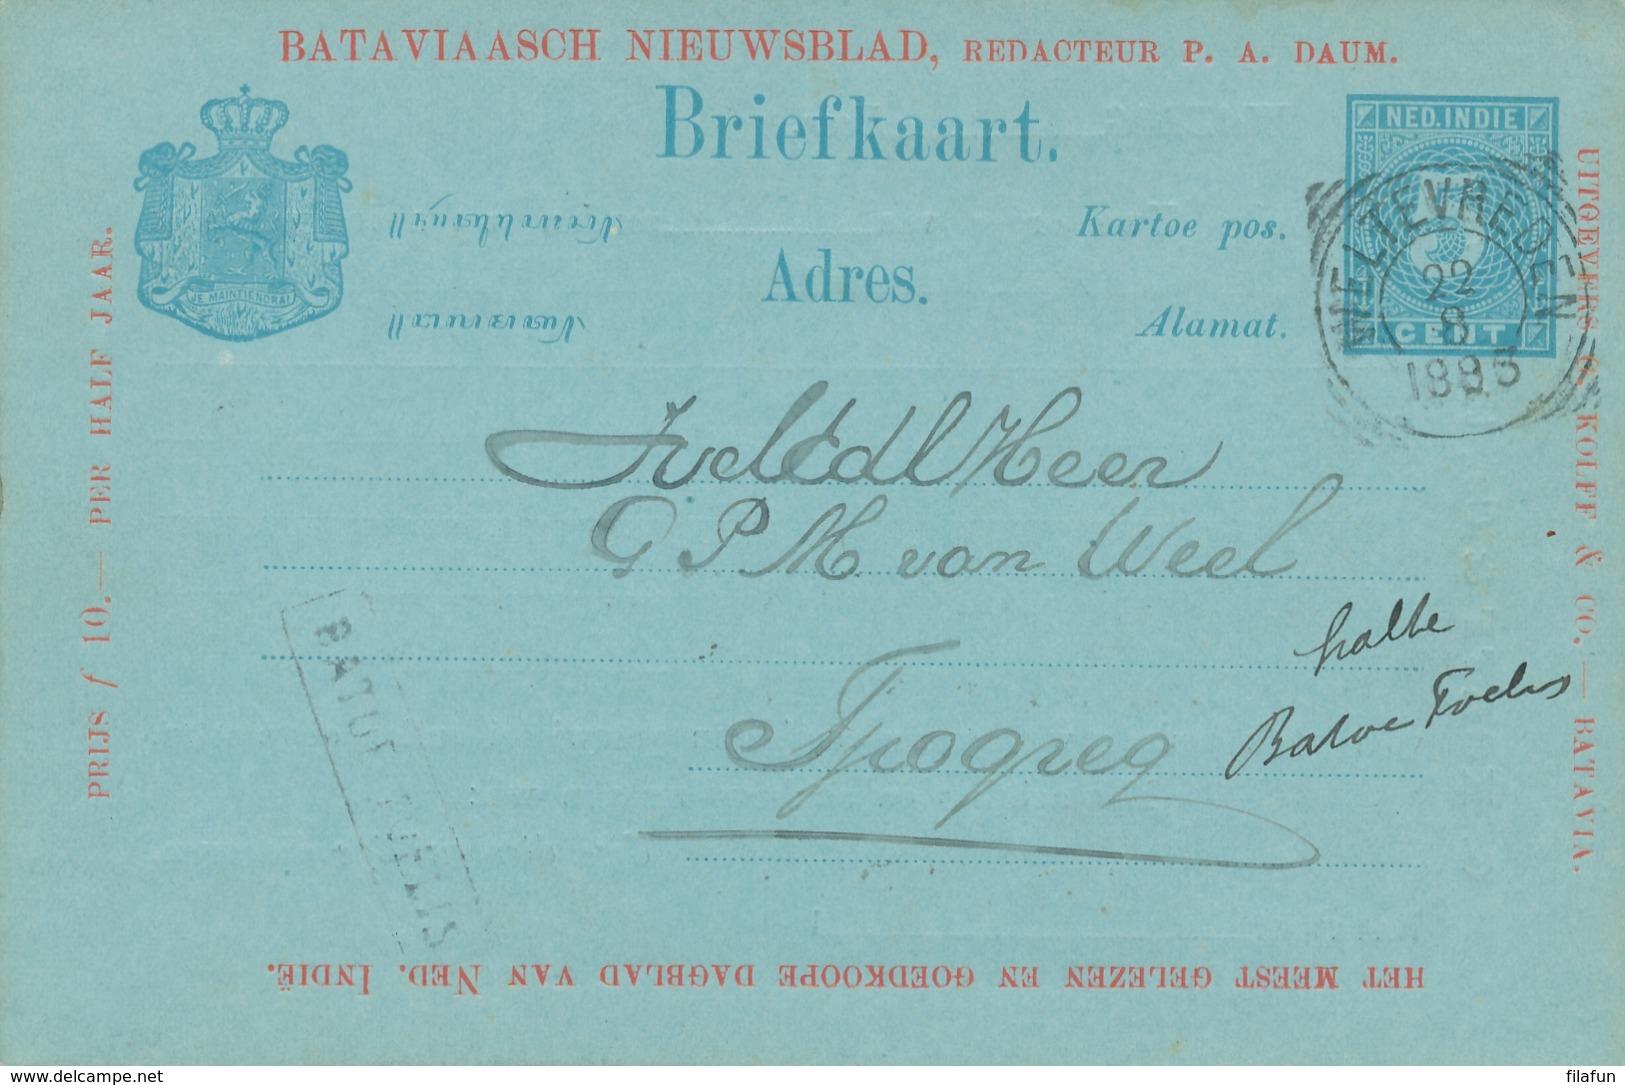 Nederlands Indië - 1893 - 5 Cent Cijfer, Briefkaart G10a Particulier Bedrukt Bataviaasch Nieuwsblad HALTE BATOE TOELIS - Indes Néerlandaises